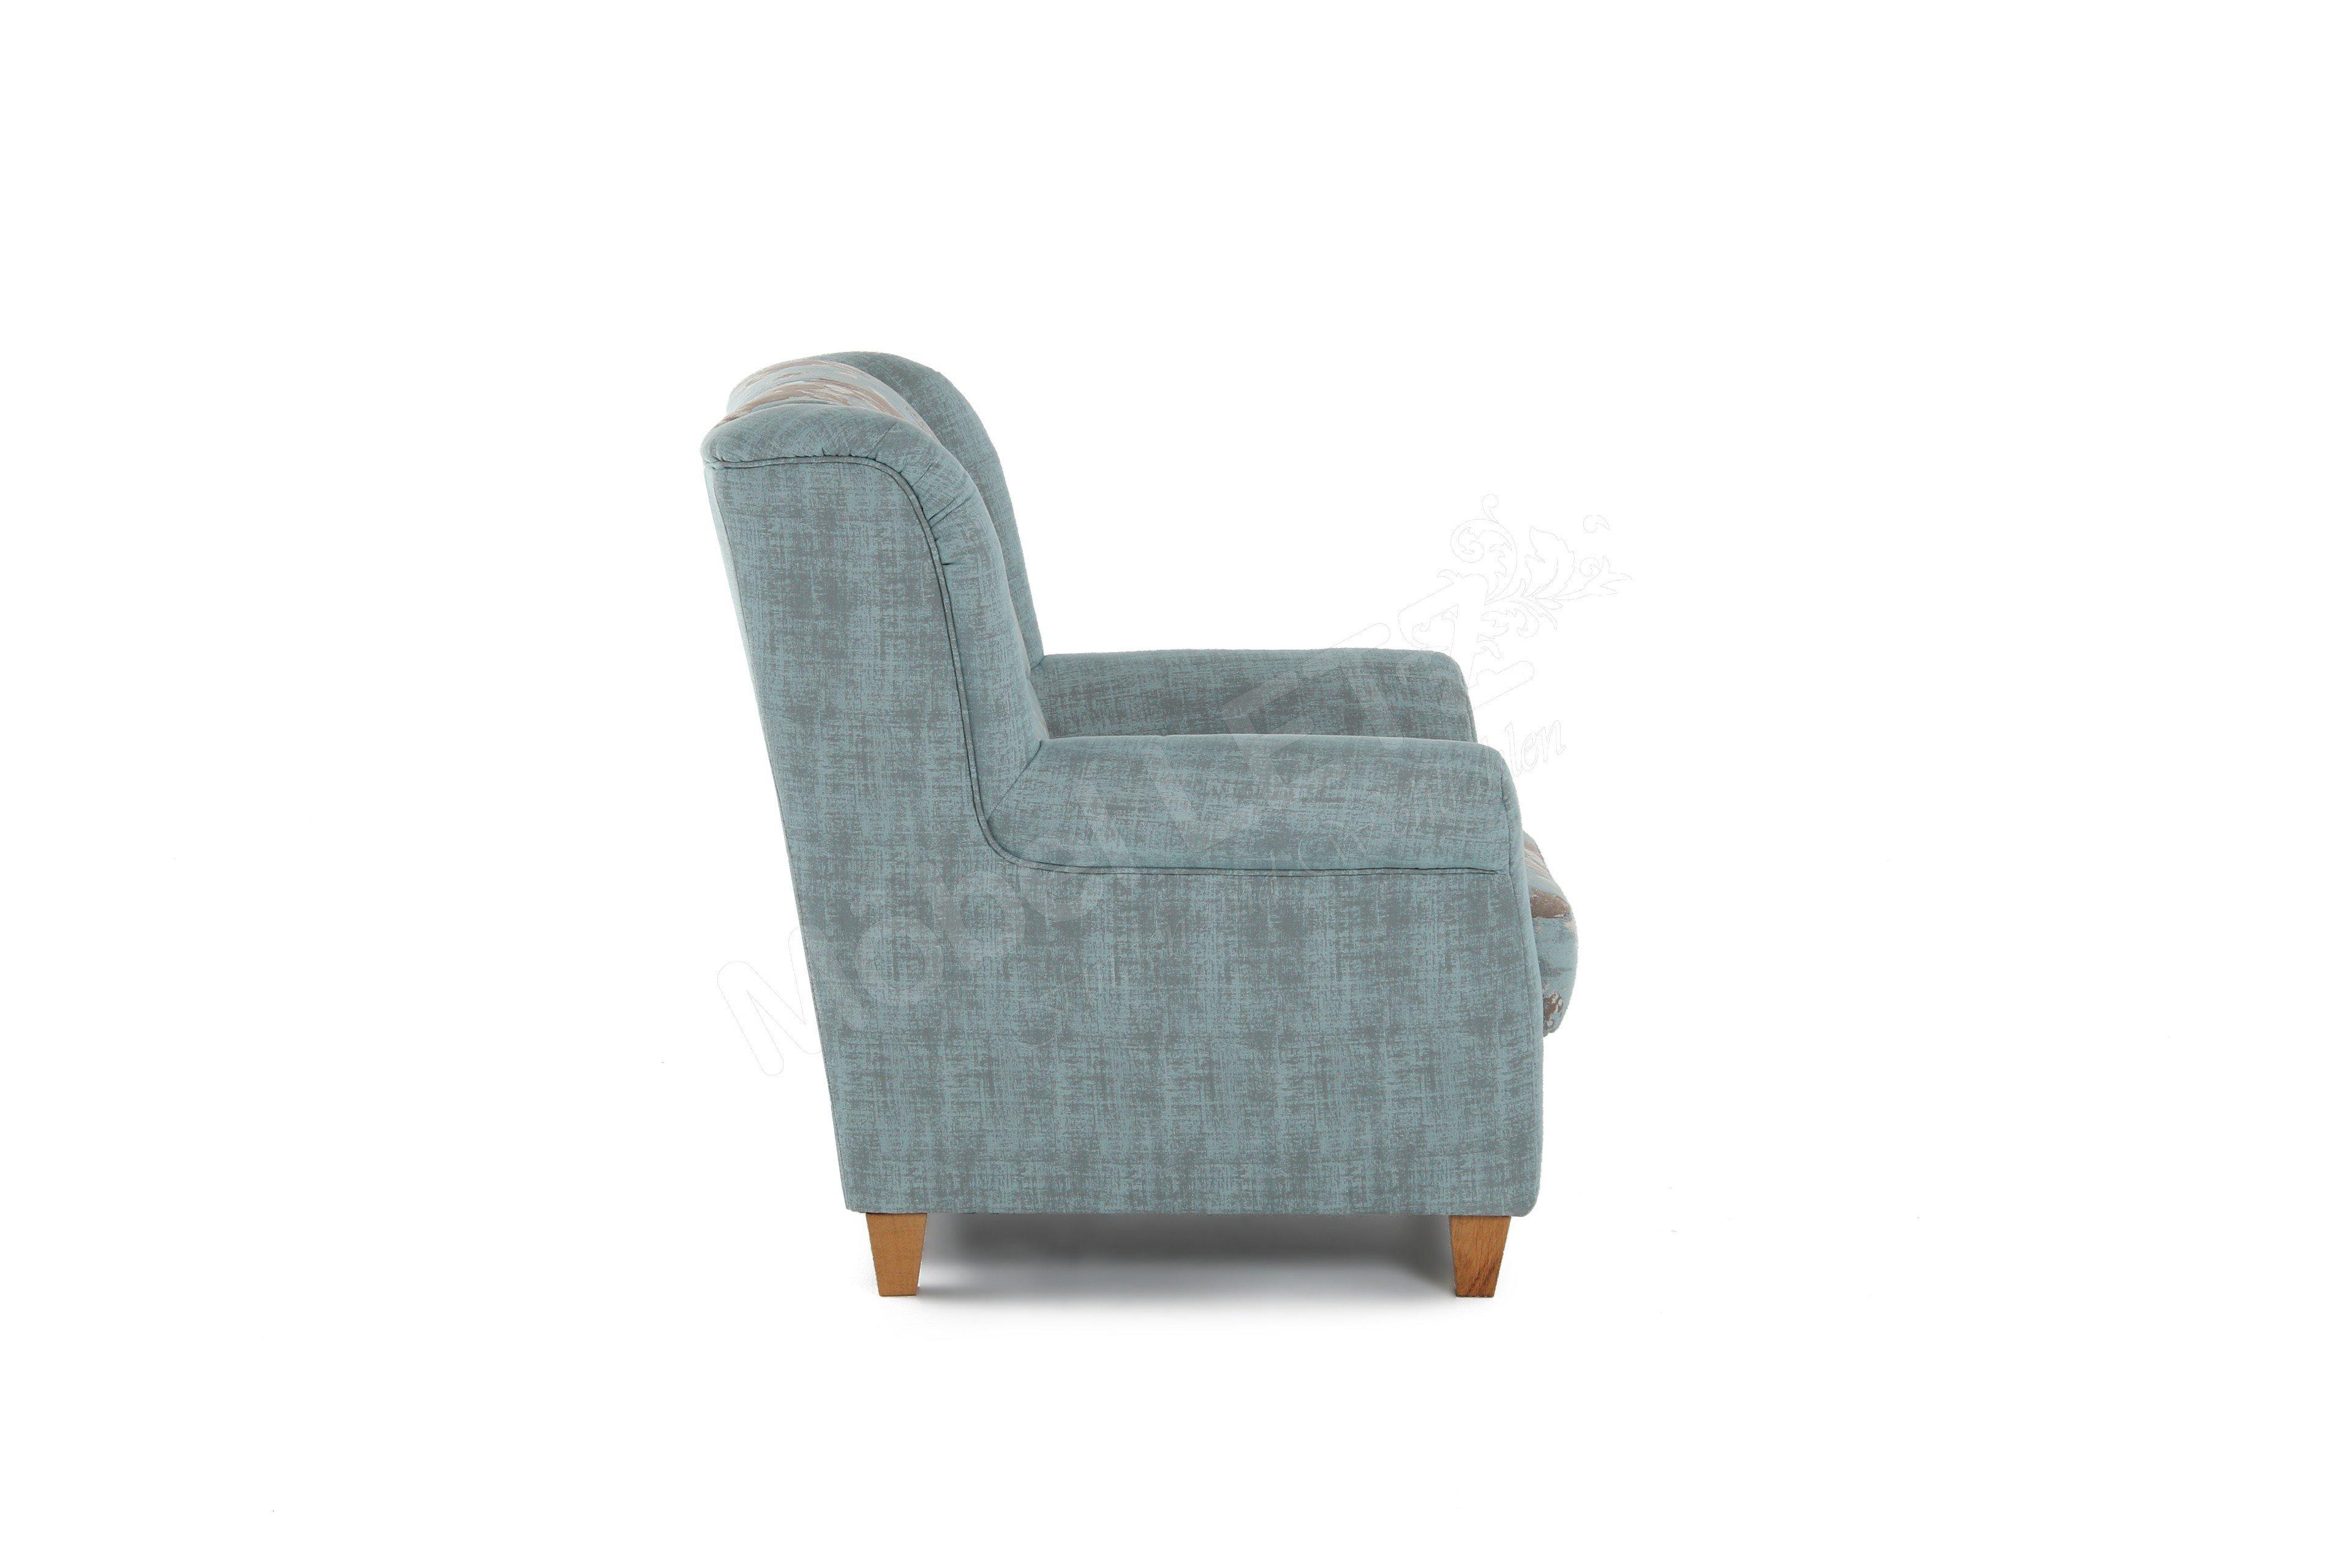 sit more f nen ohrenbackenessel mint m bel letz ihr online shop. Black Bedroom Furniture Sets. Home Design Ideas